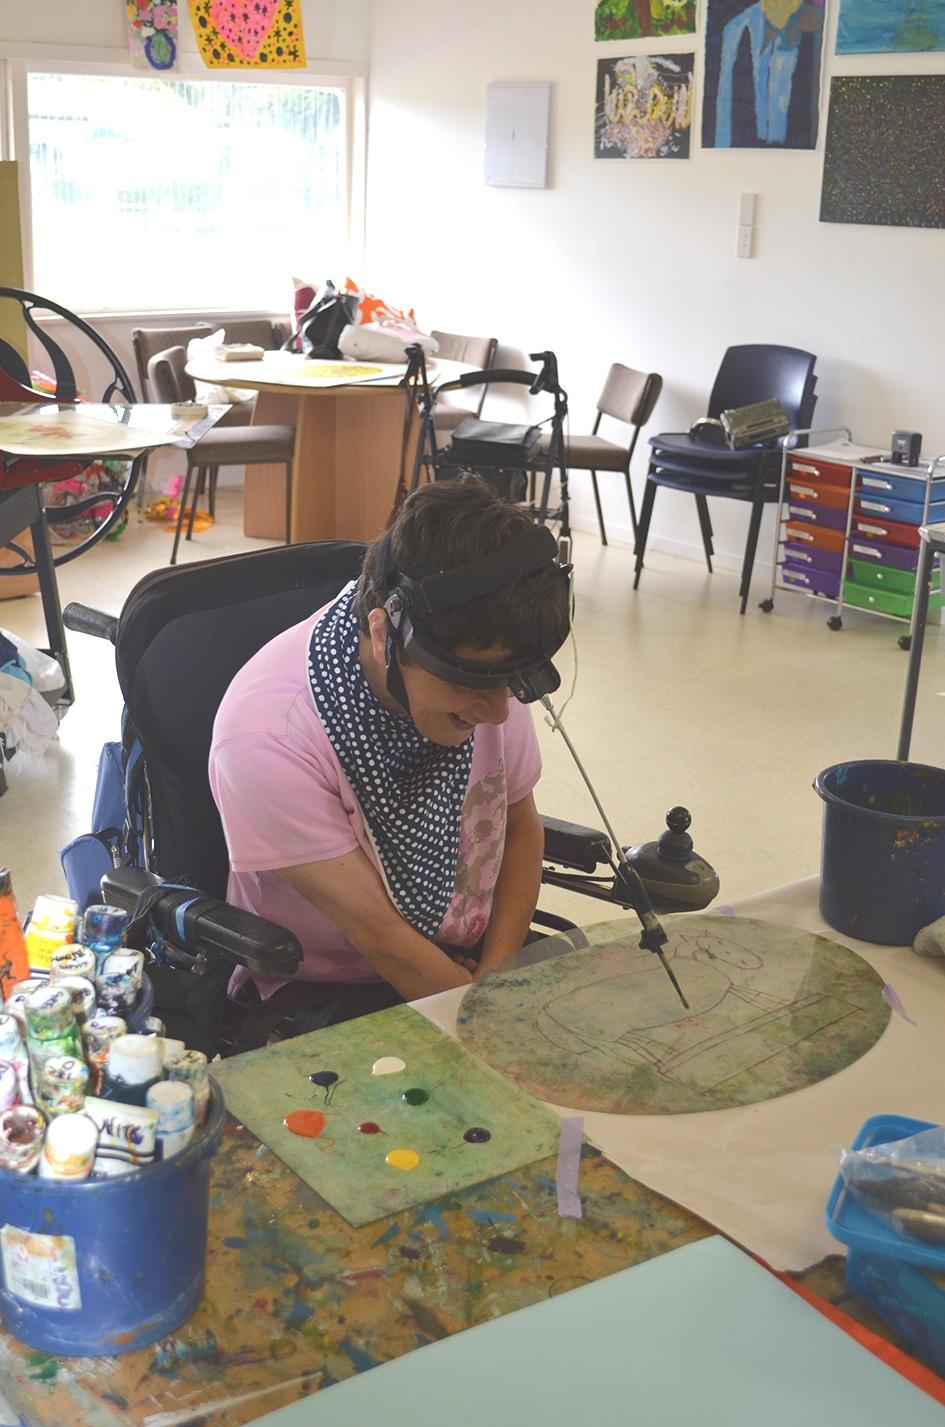 Lizzie Collenette in the studio